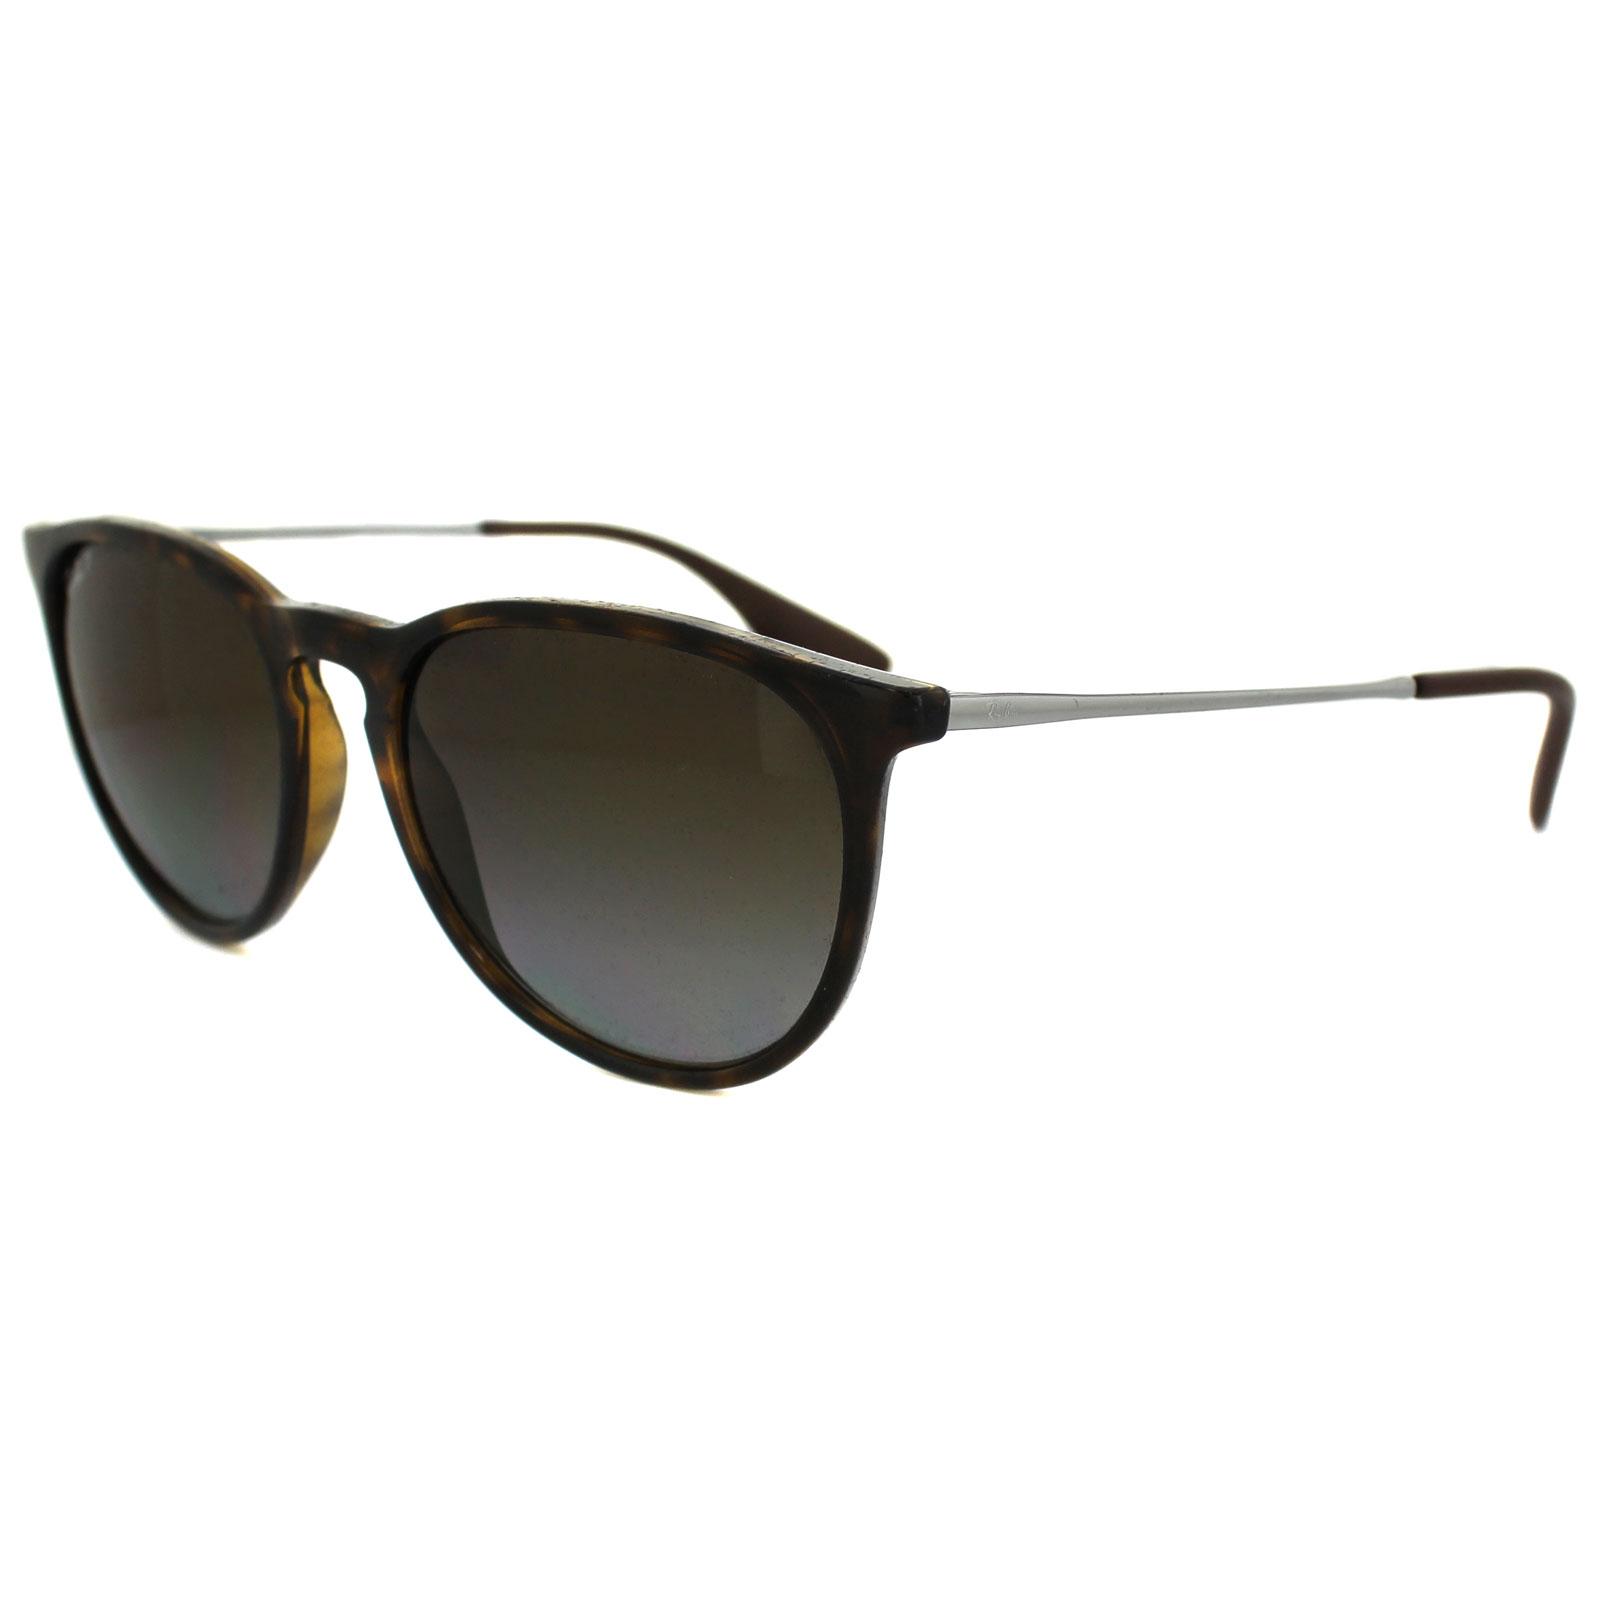 6fe0d51815d2 Sentinel Ray-Ban Sunglasses Erika 4171 710 T5 Tortoise Gunmetal Brown  Gradient Polarized